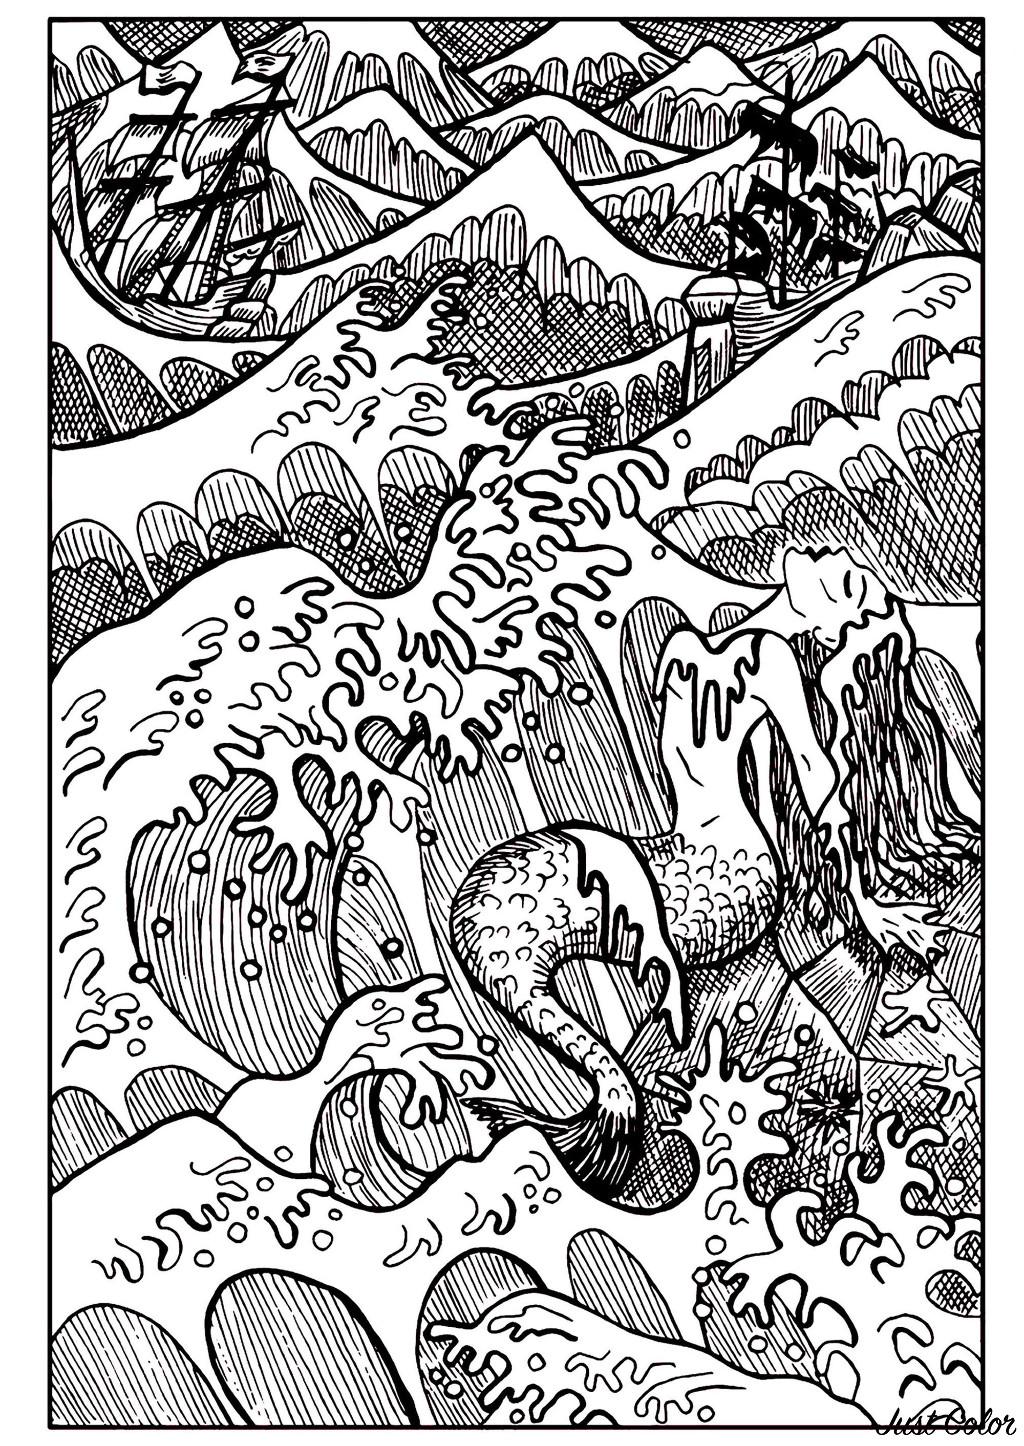 Malbuch Fur Erwachsene  : Meerjungfrauen - 2